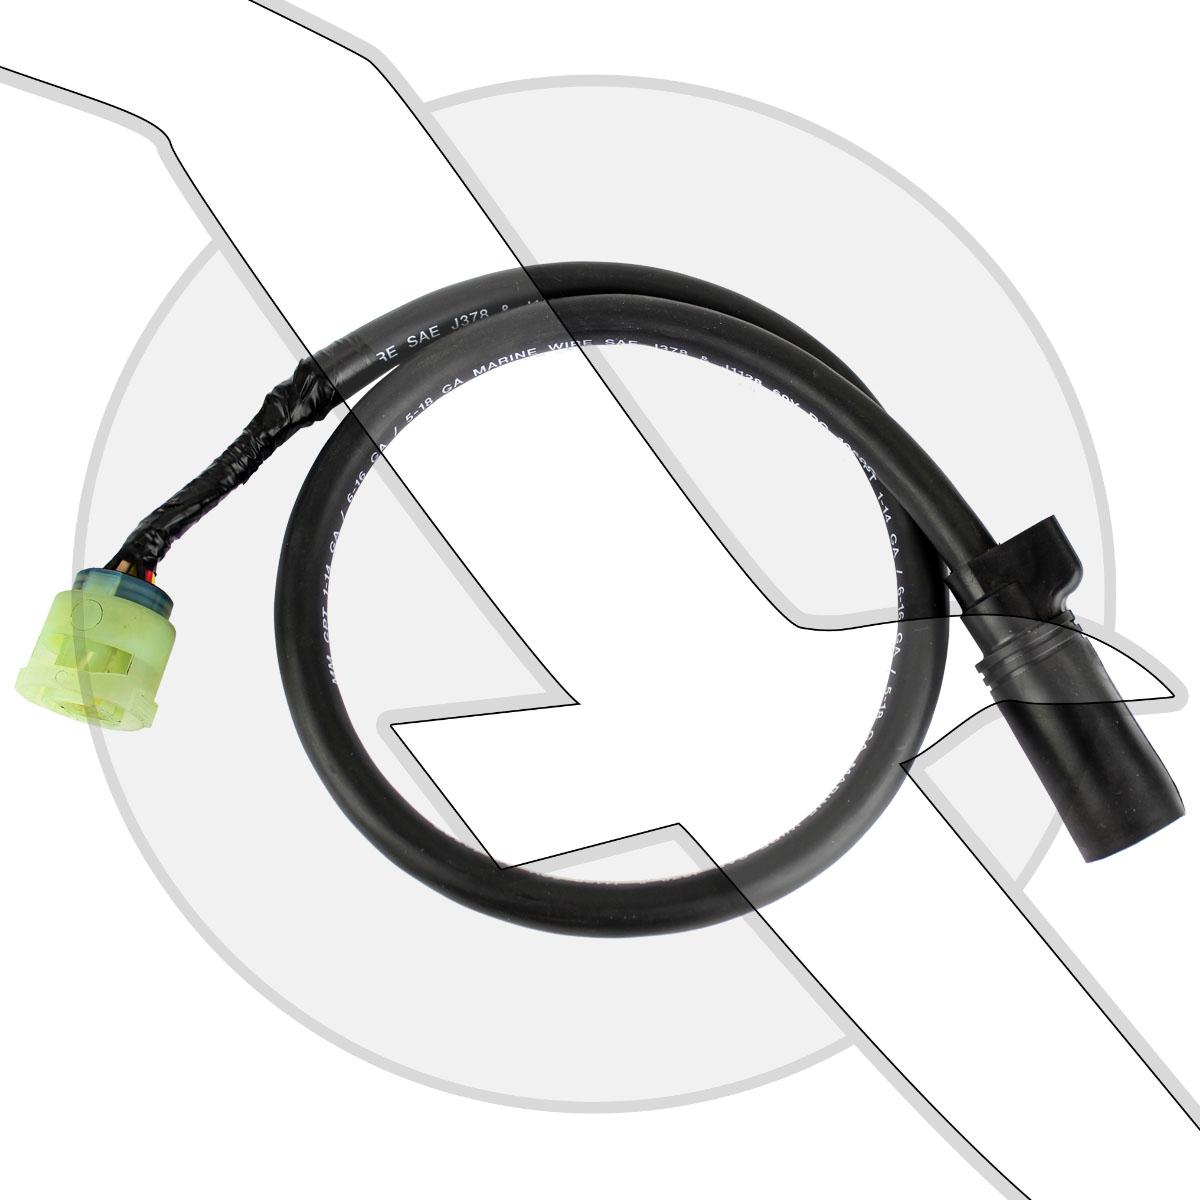 mercury marine mercruiser ignition key switch adapter wire. Black Bedroom Furniture Sets. Home Design Ideas